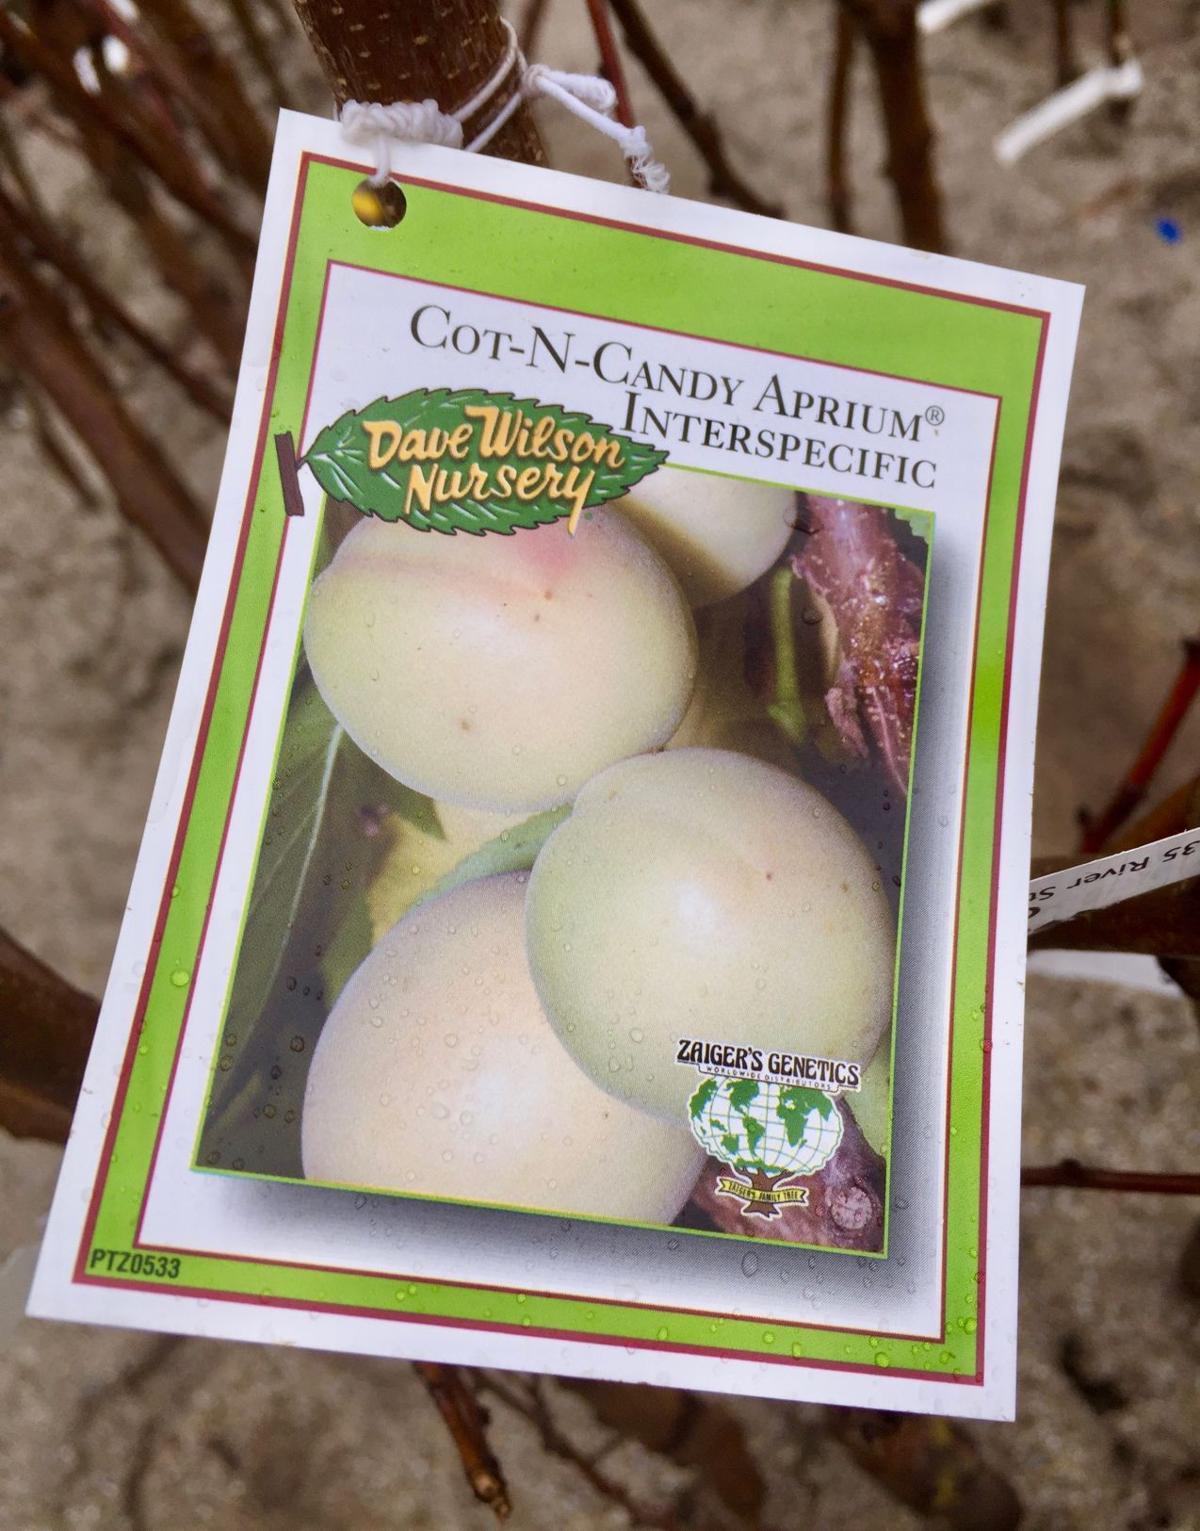 Cot-N-Candy Aprium